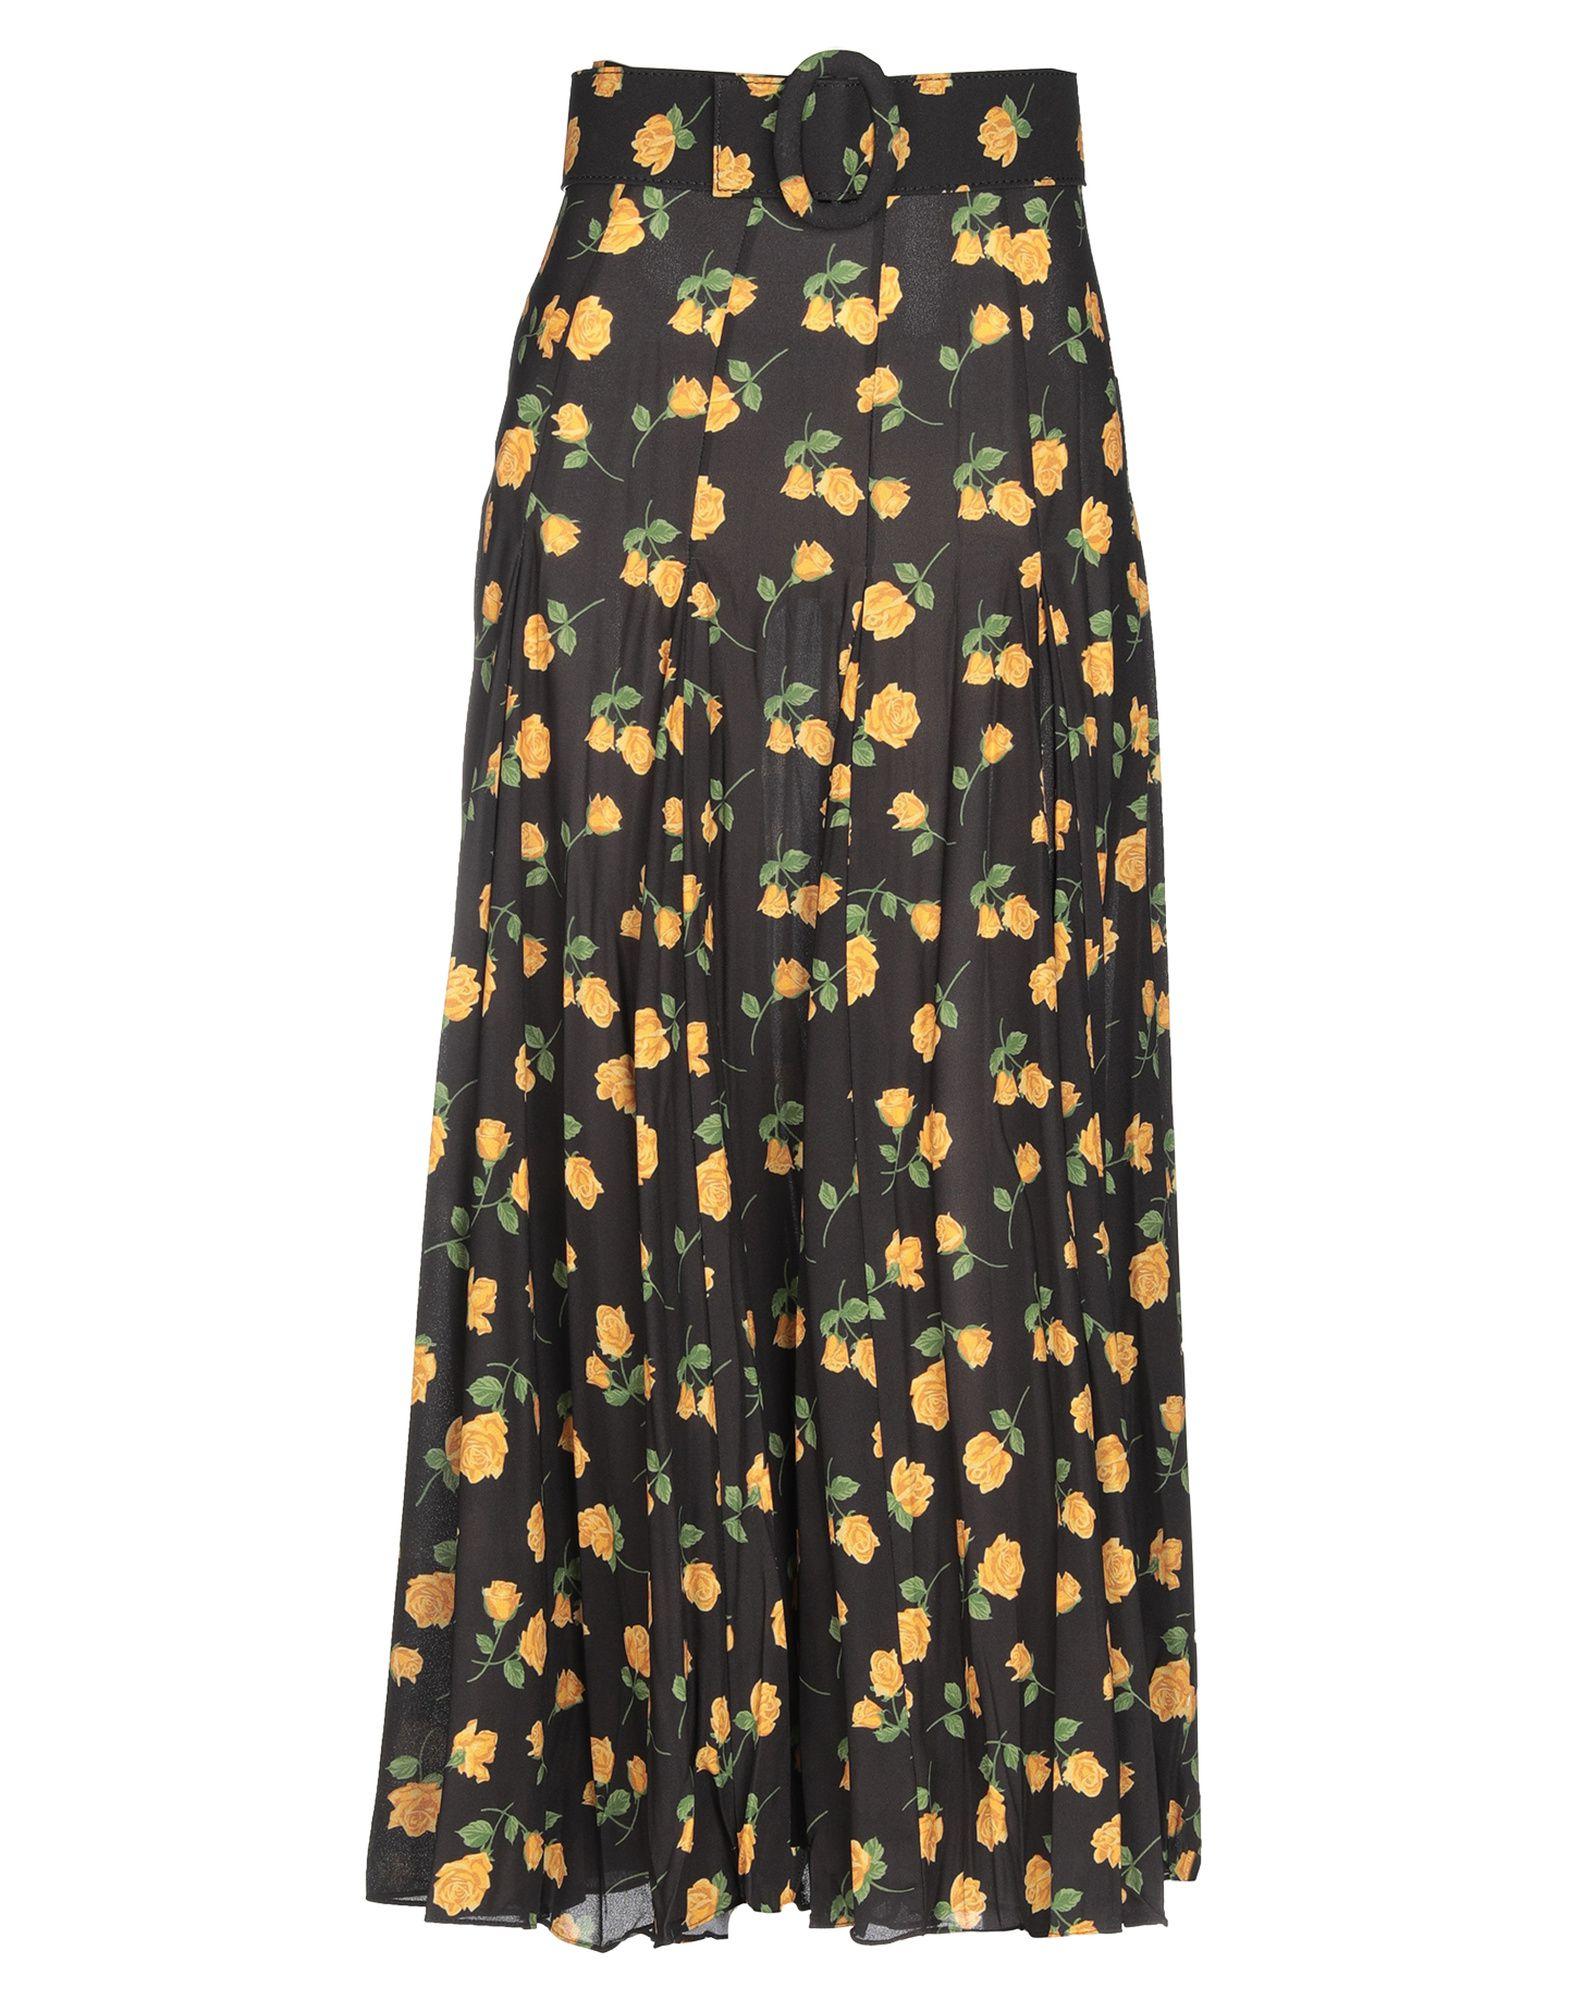 MICHAEL KORS COLLECTION Длинная юбка michael van der ham длинная юбка